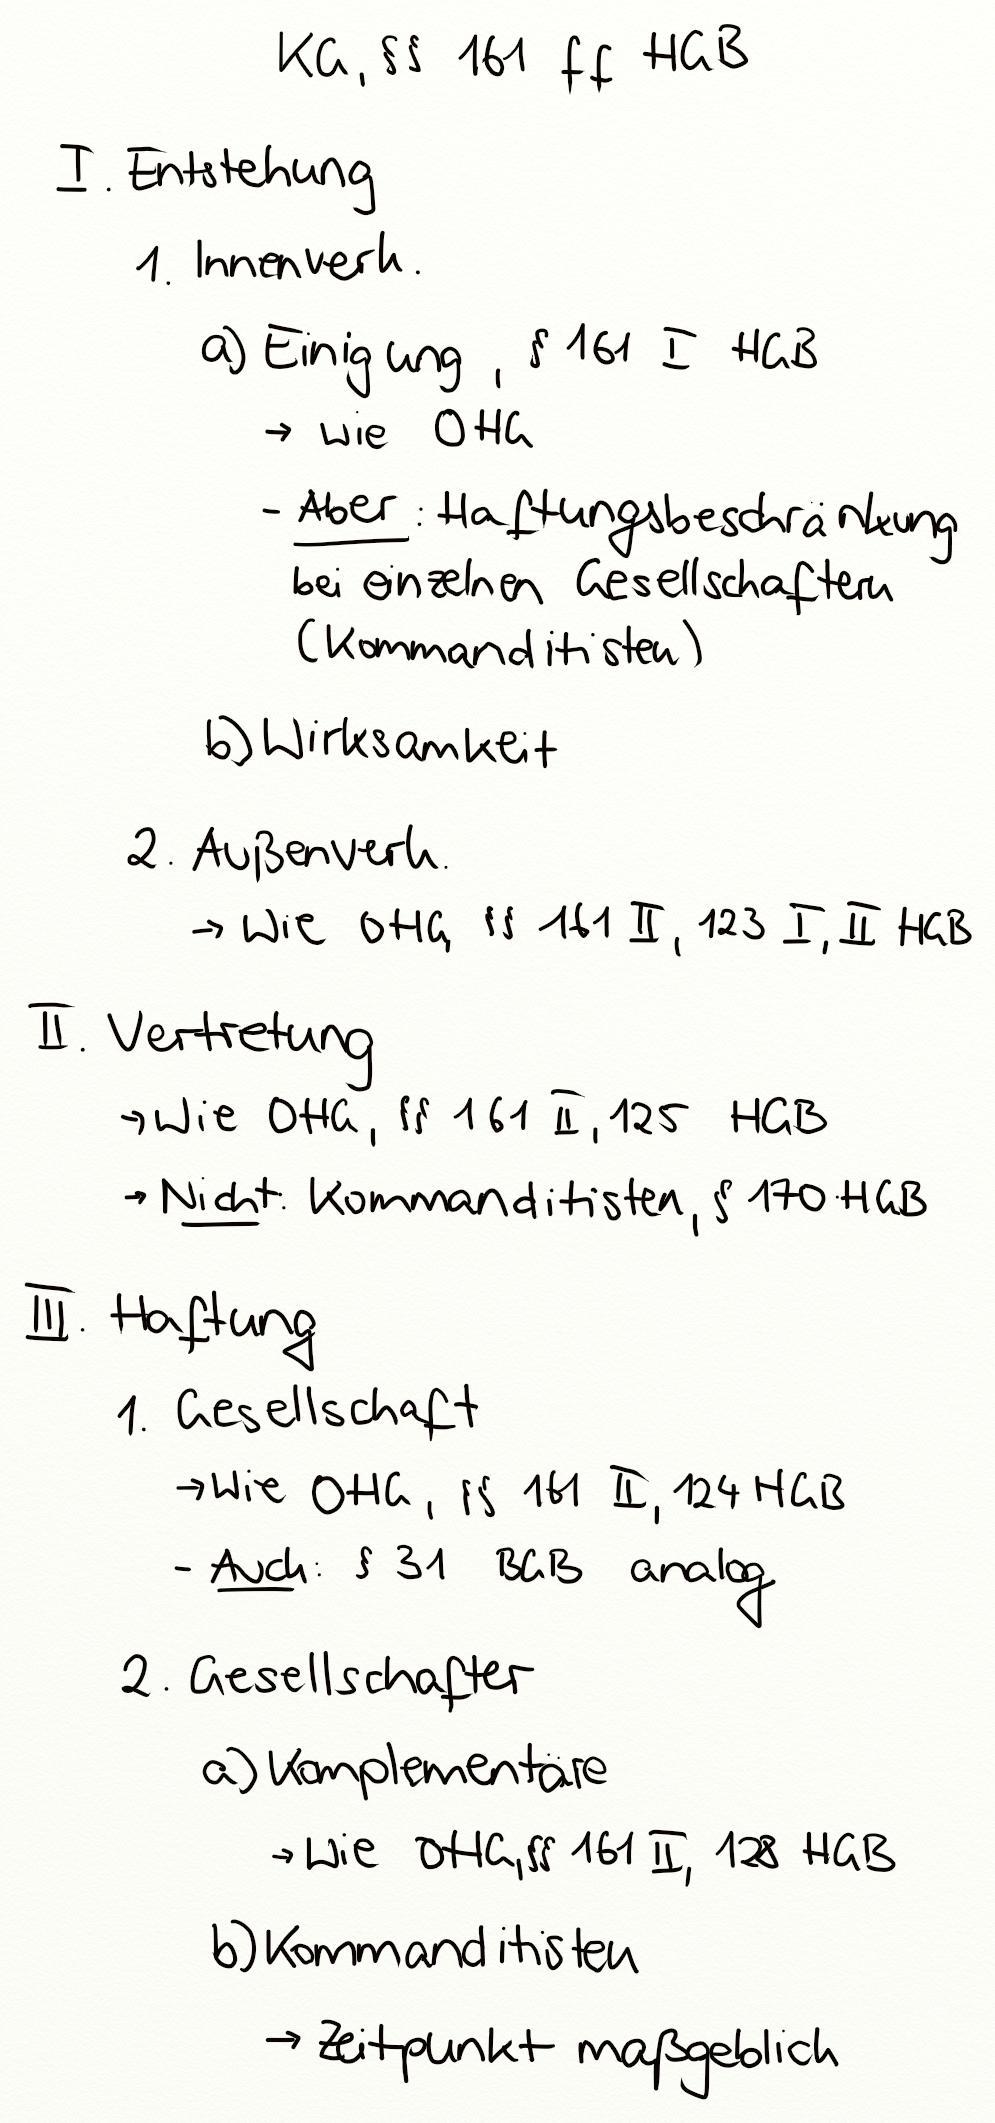 KG, §§ 161 ff. HGB - Exkurs - Jura Online